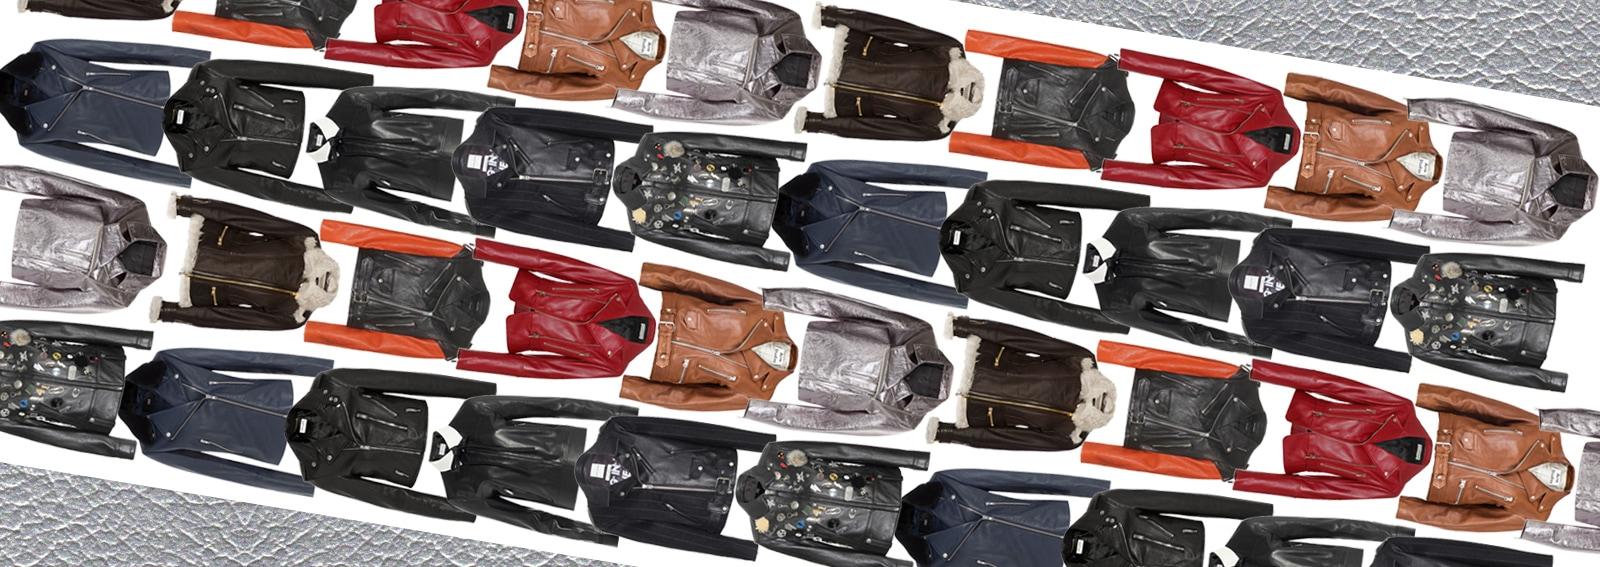 cover giacche in pelle 2015 desktop